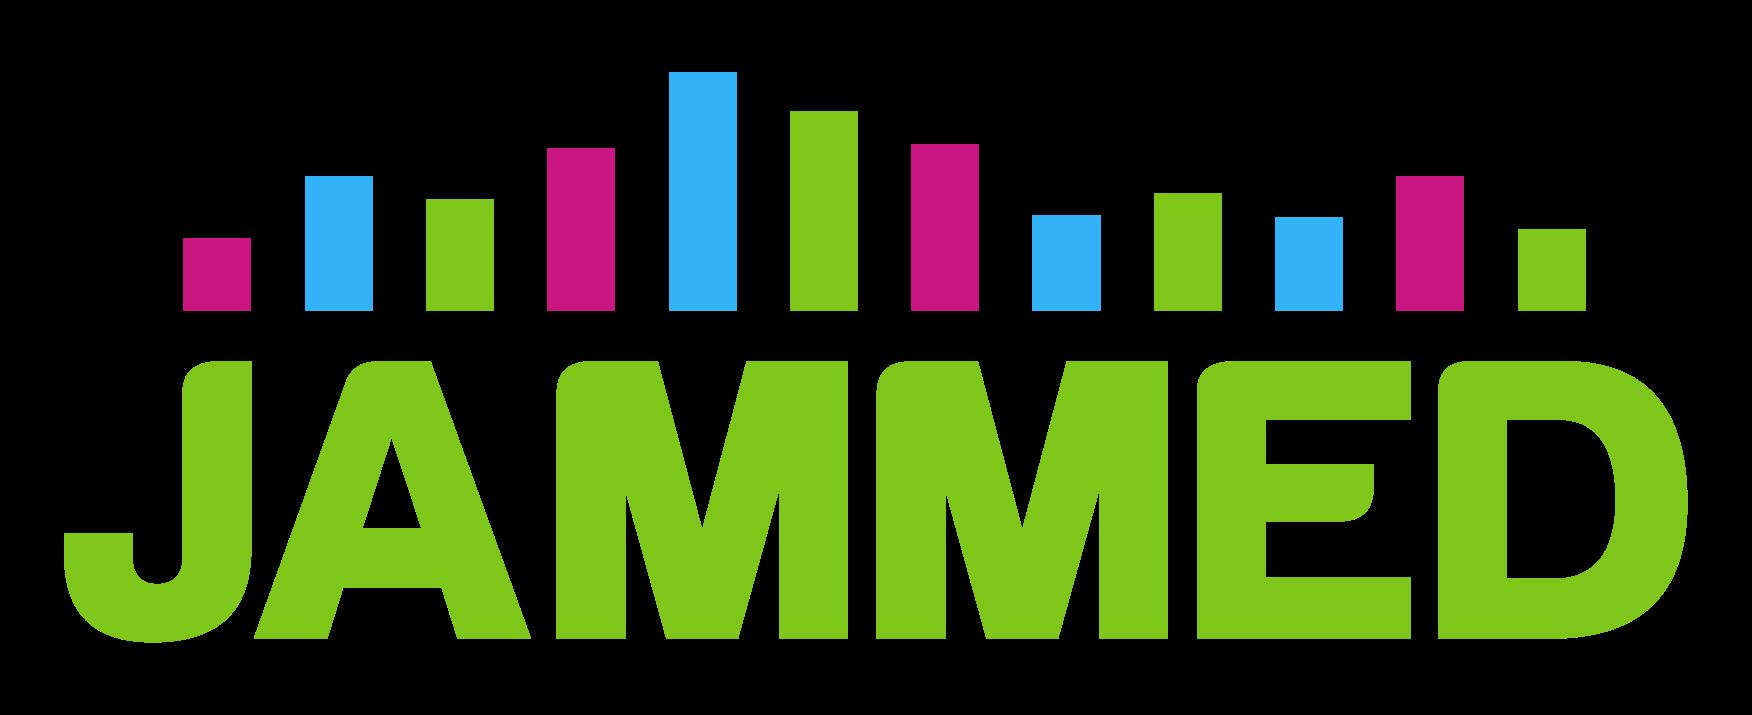 Jammed Logo